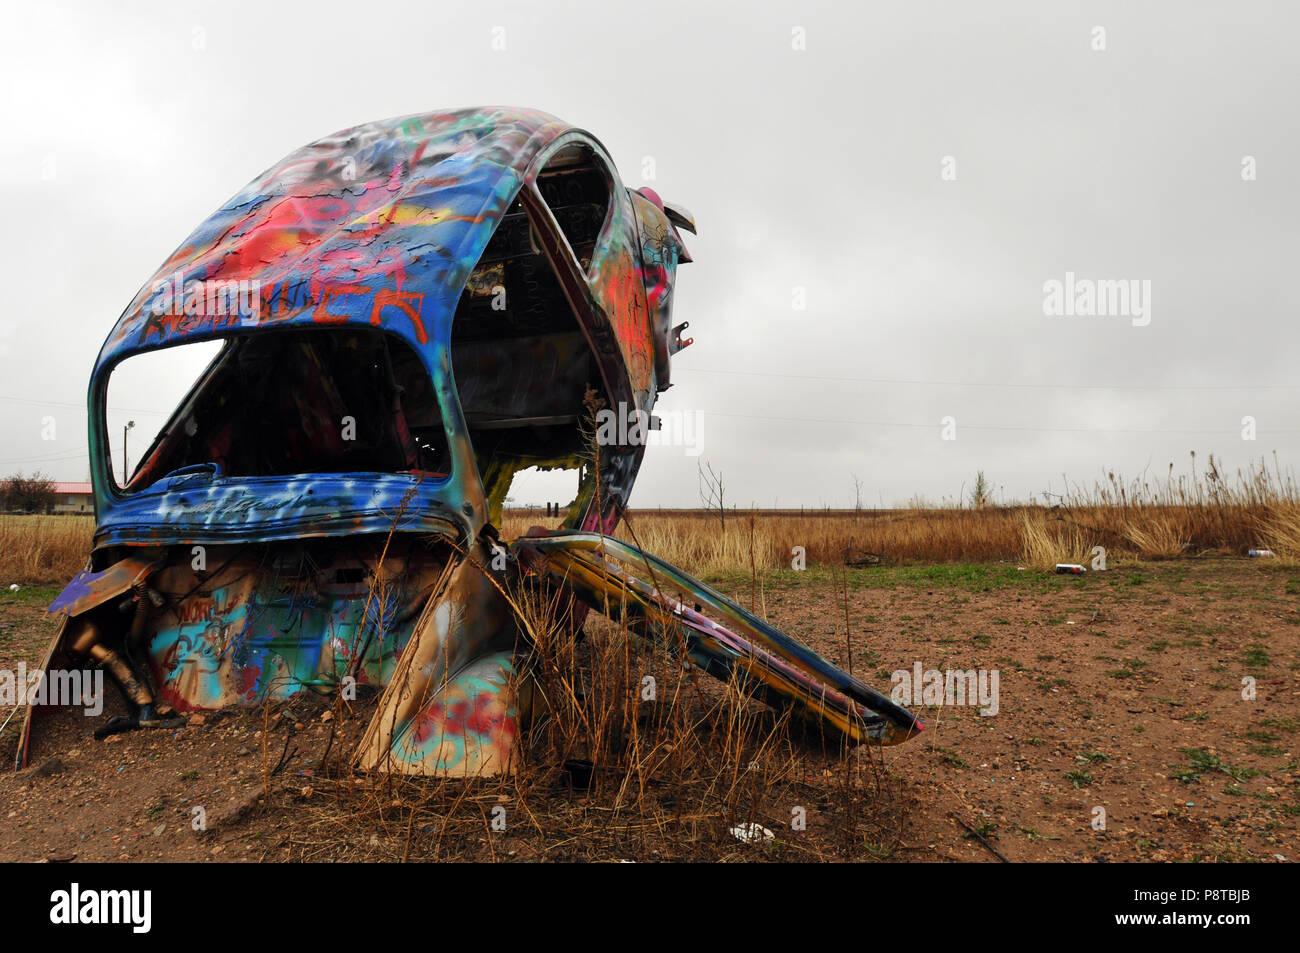 One Of Five Volkswagen Beetles That Make Up Vw Slug Bug Ranch In The